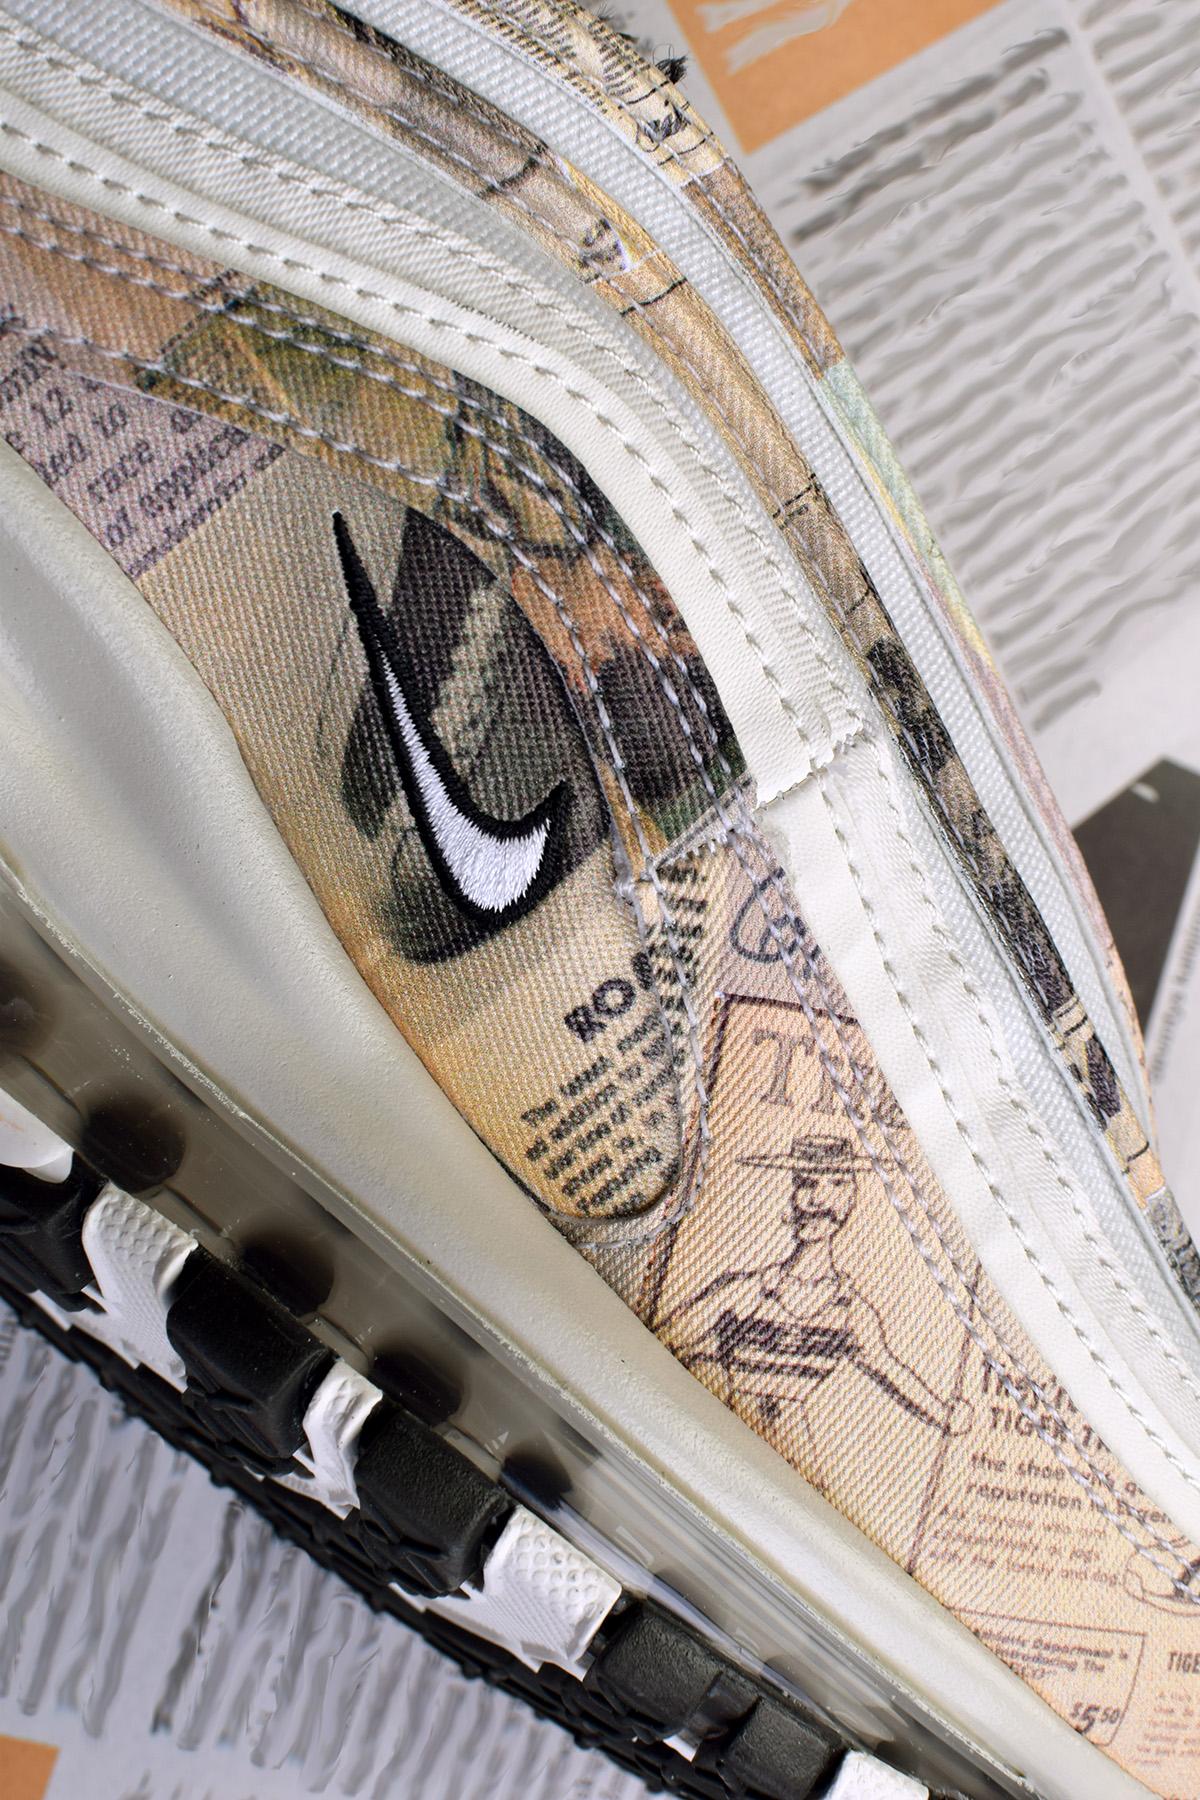 Nike Air Max 97 Black Mamba NHS Gateshead